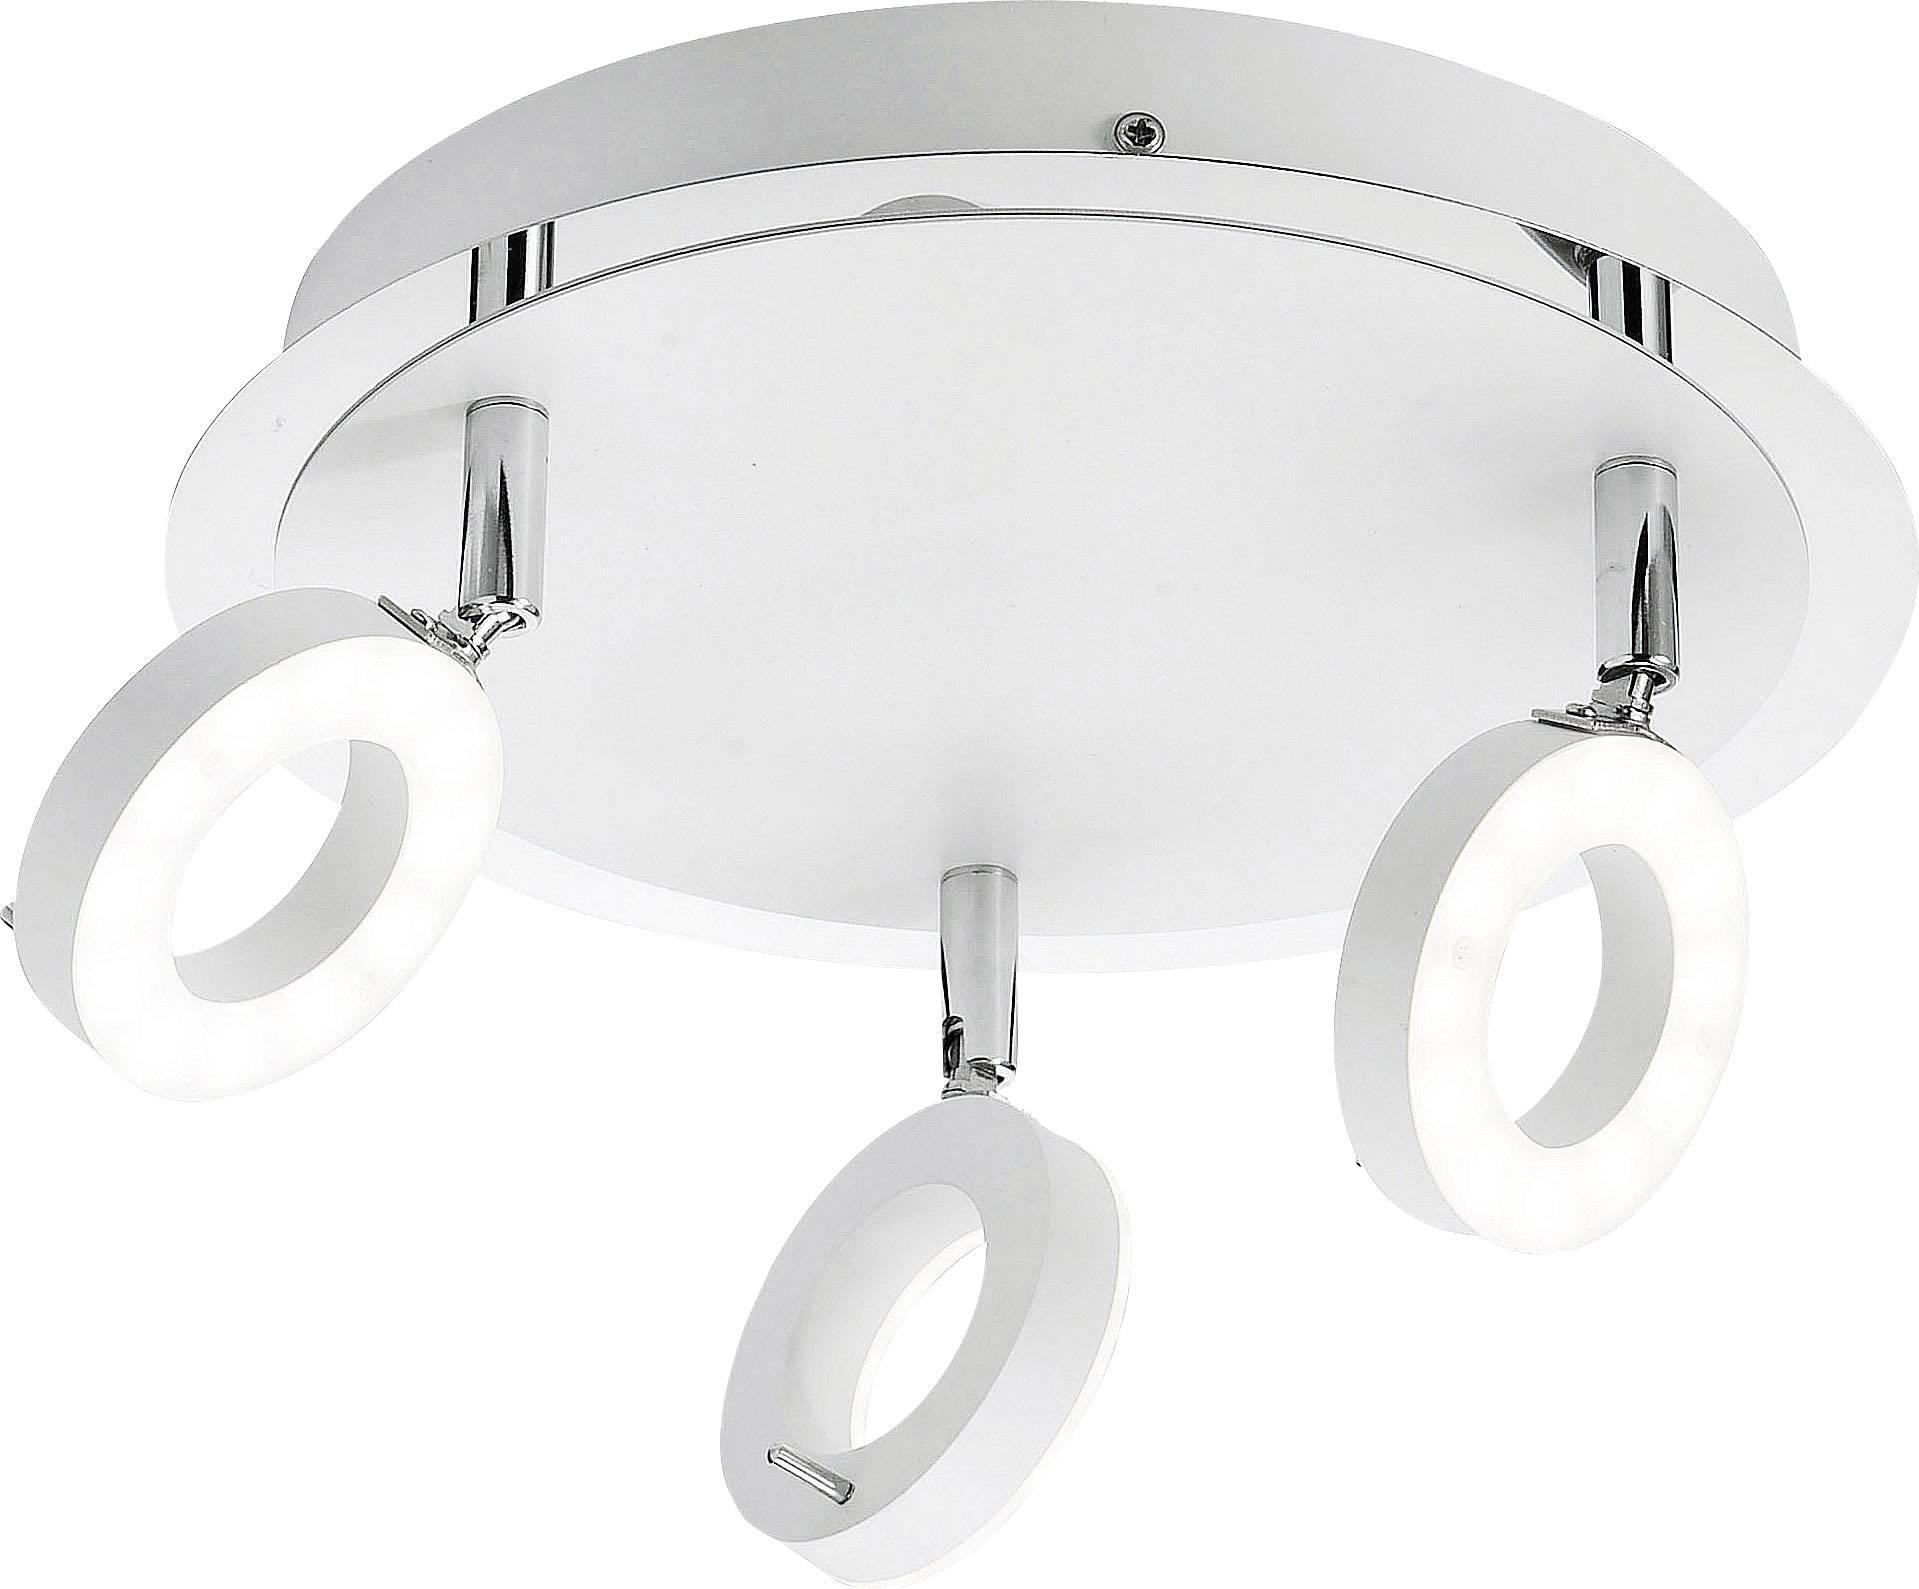 Ikea Badkamer Plafondlamp : Plafonniere badkamer ikea geweldig ikea badkamer plafondlamp